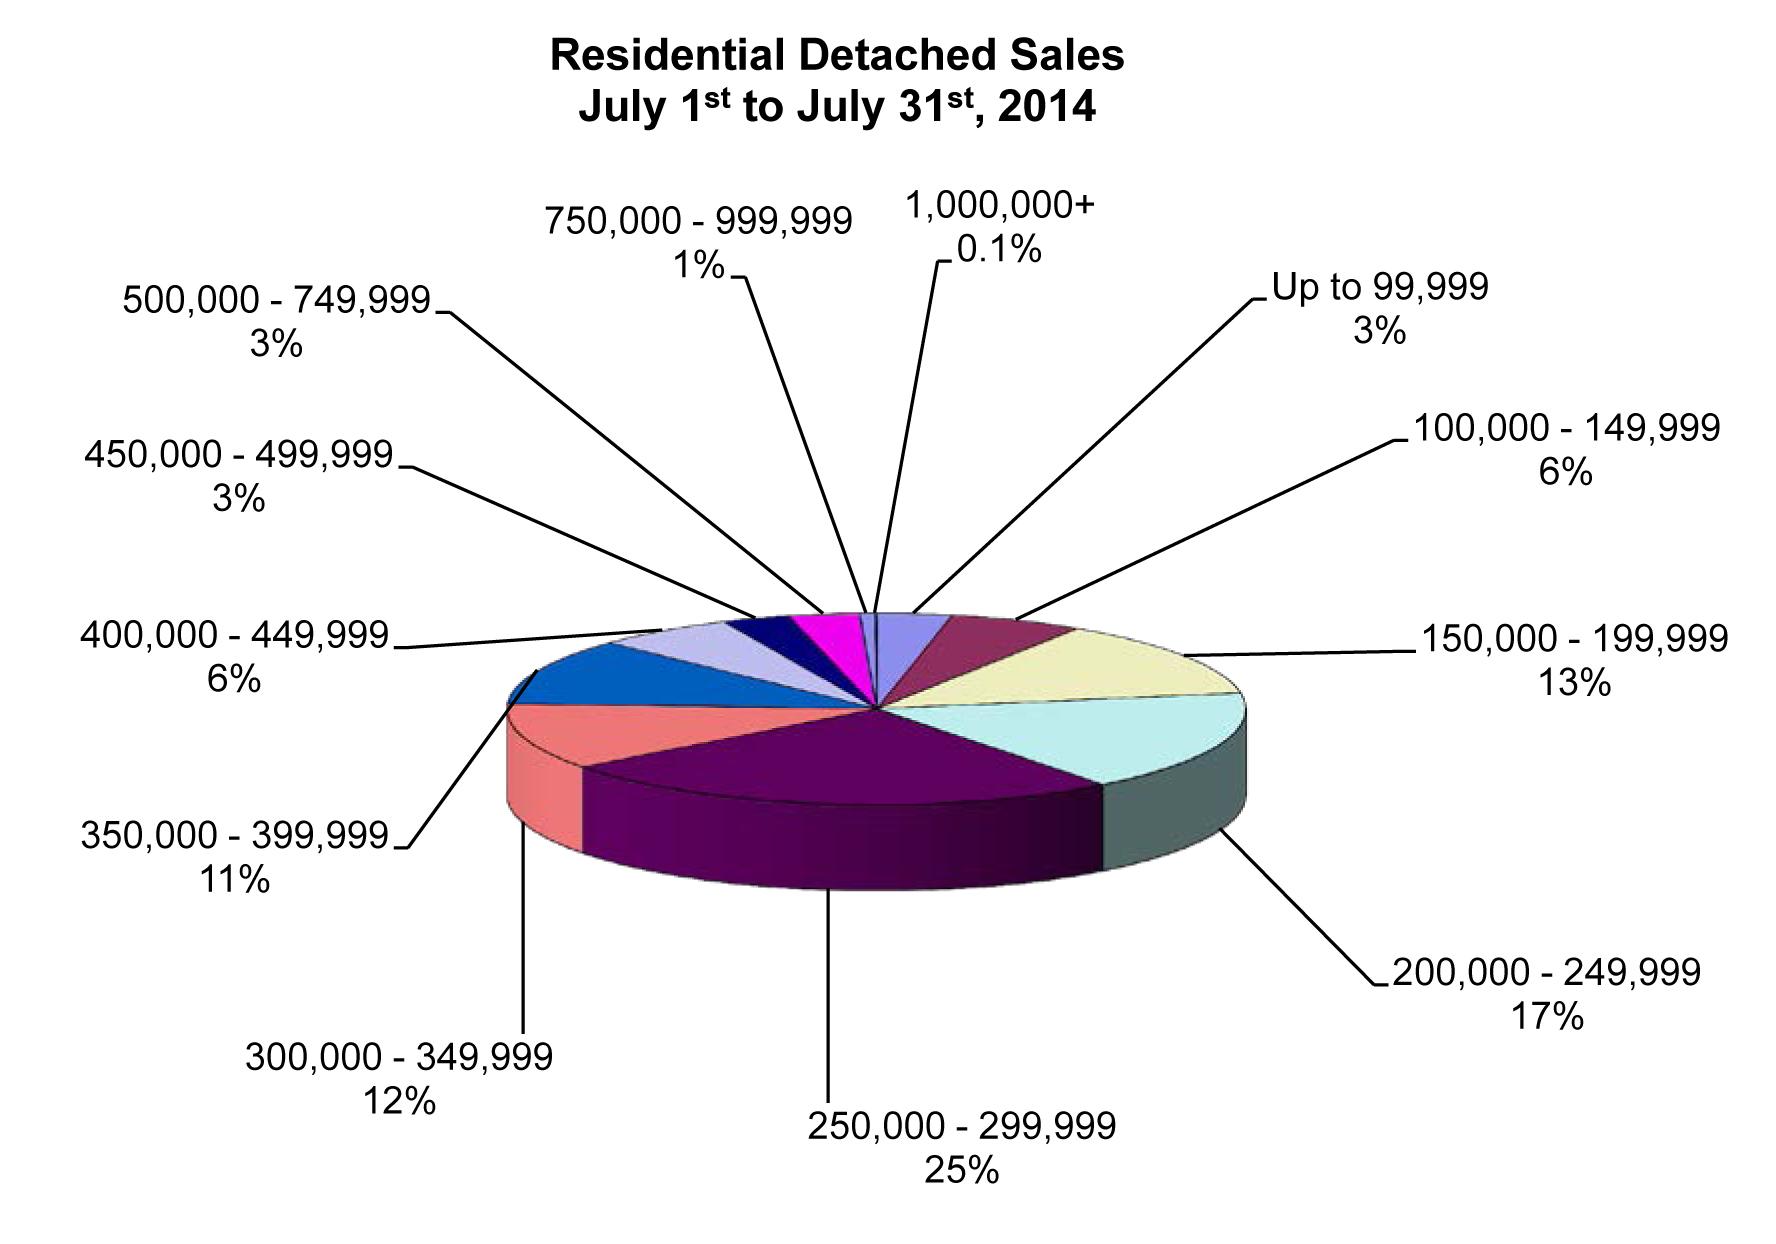 RD Sales Pie Chart July 2014